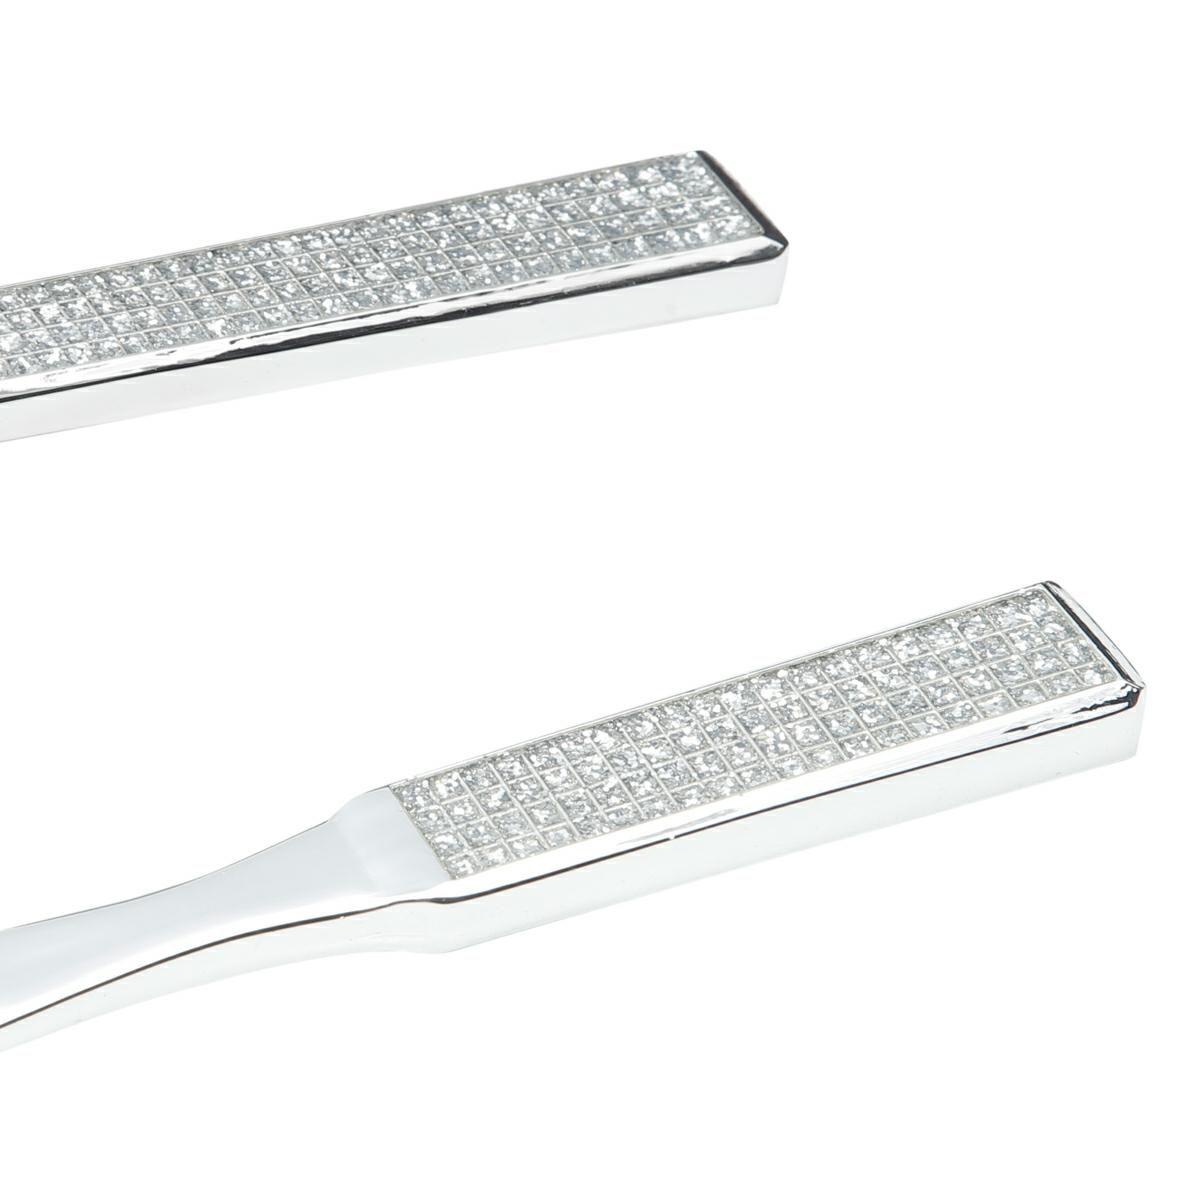 Conjunto Espátula e Pá 28 cm para bolo de zamac prateado Epóxy Prestige - 4740